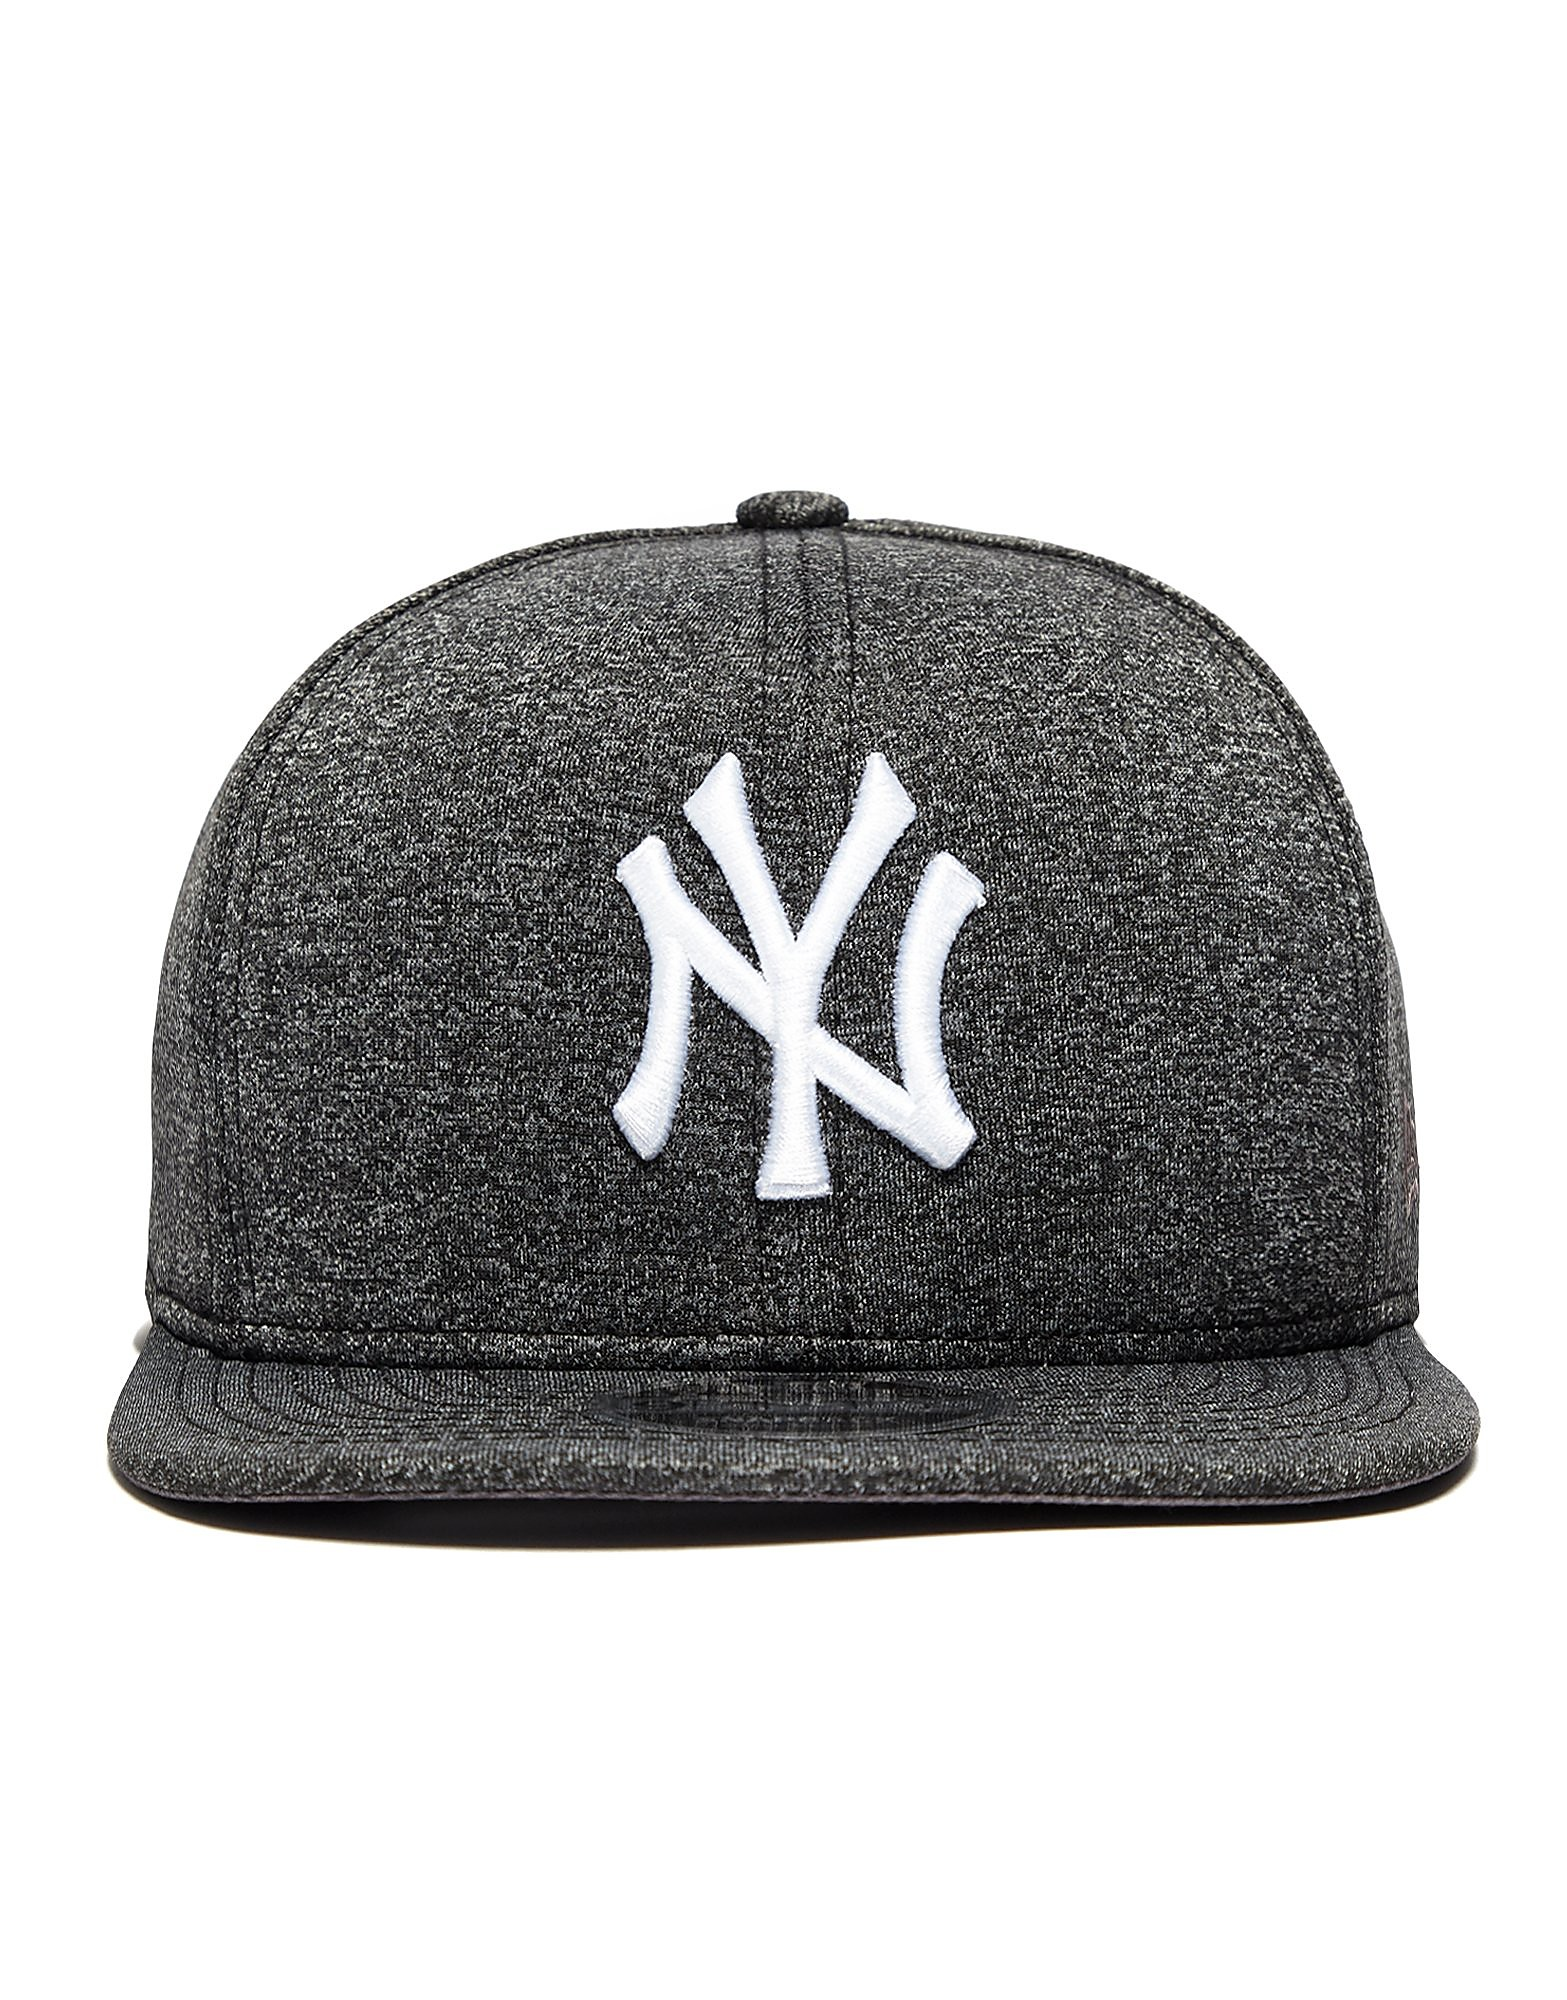 New Era 9FIFTY New York Yankees Snapback Cap